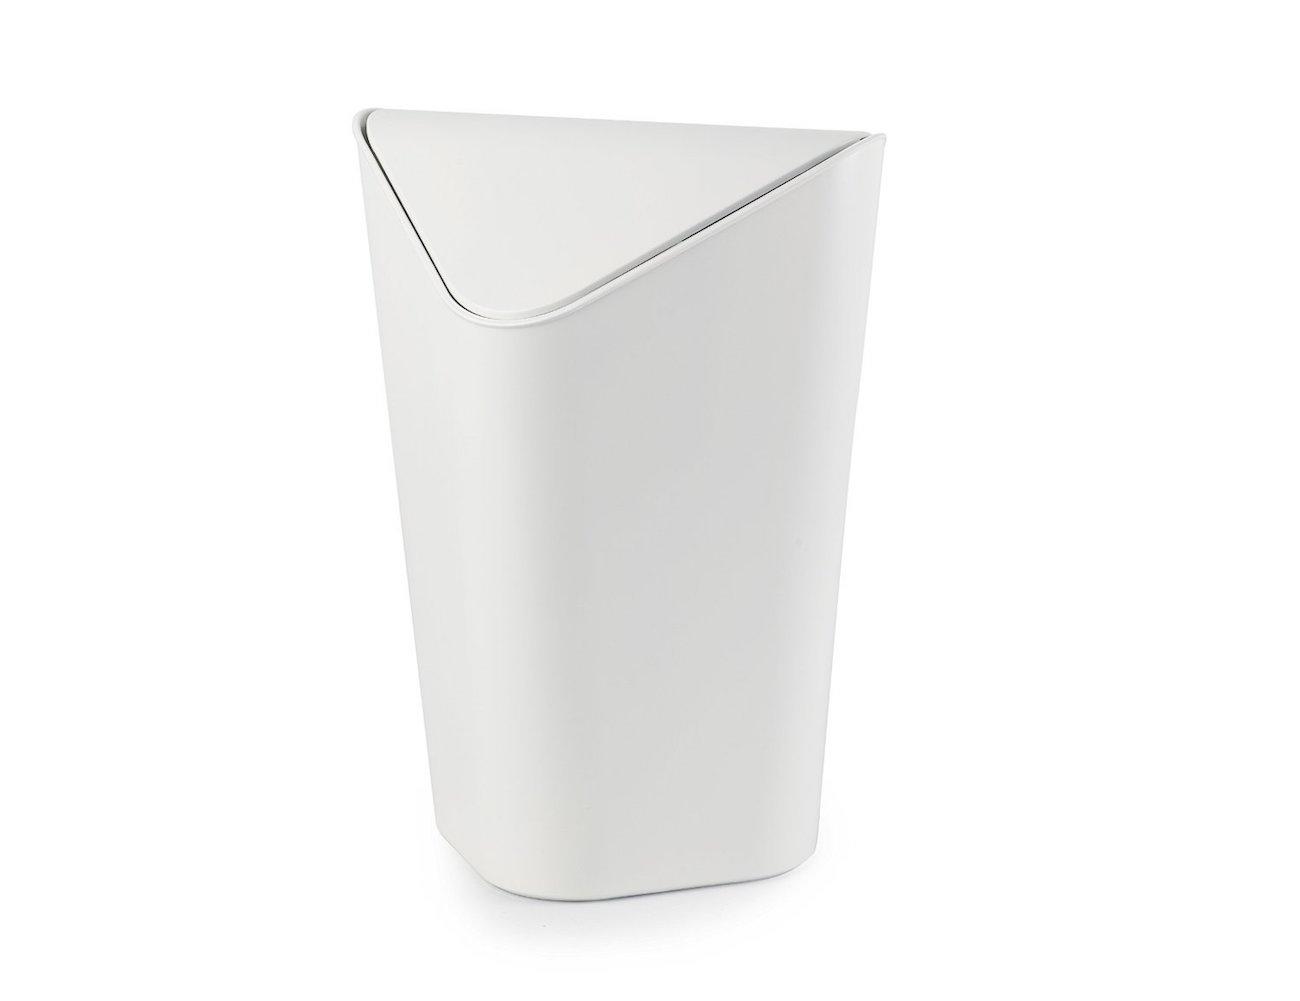 Corner waste bin perfect waste bin for corners review the gadget flow - Corner wastebasket ...